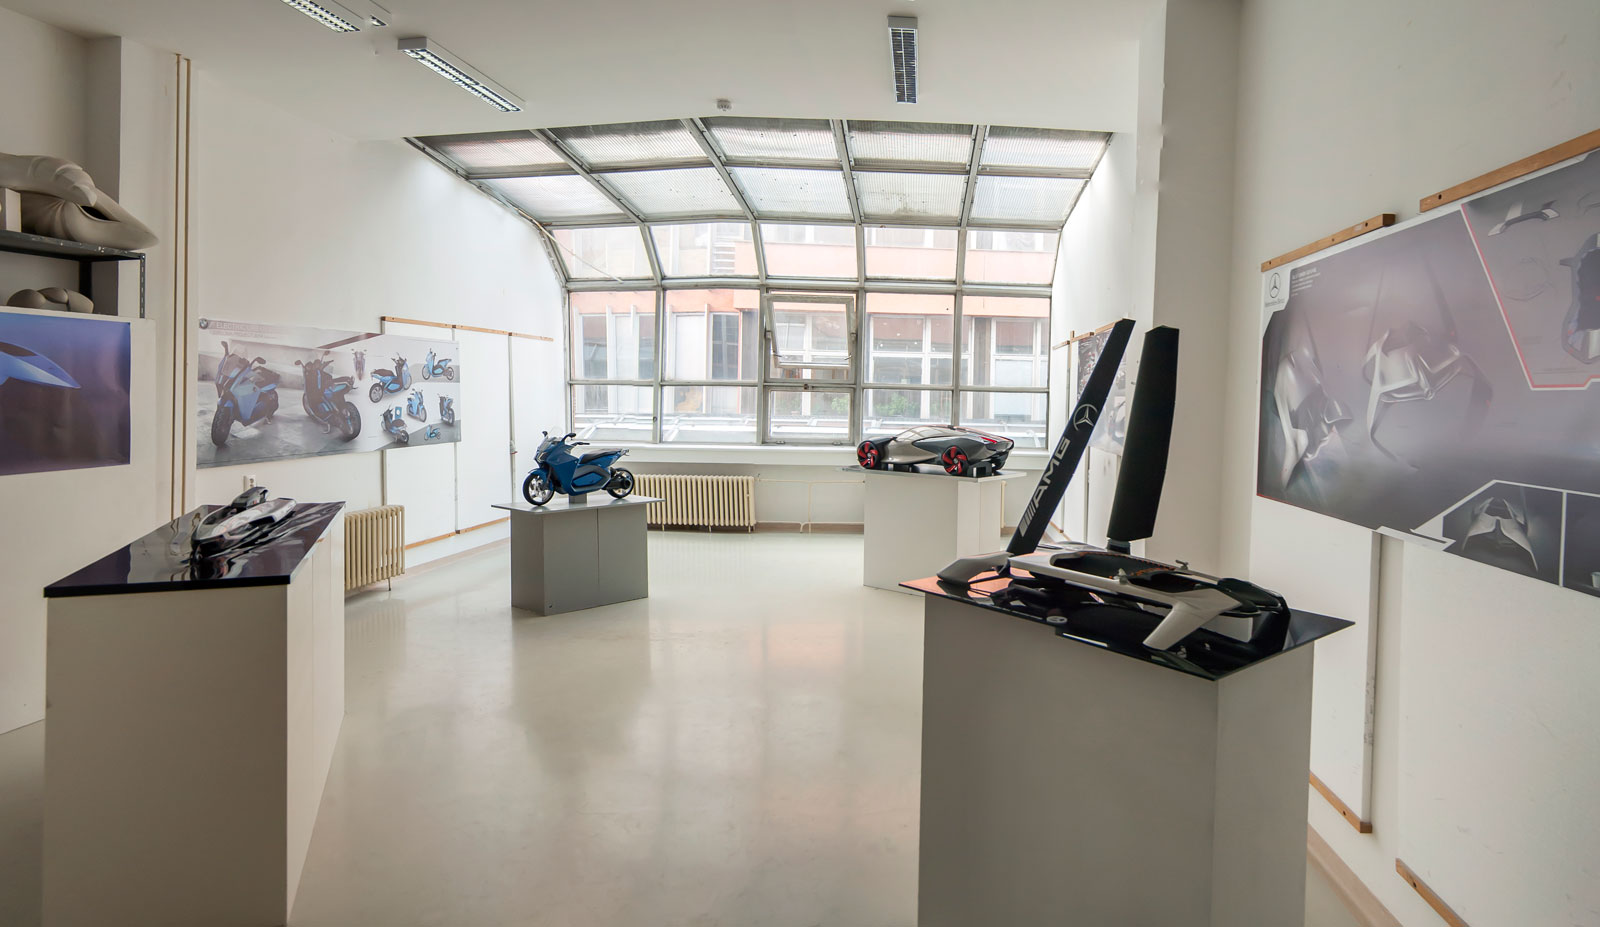 Academy Of Fine Arts And Design In Bratislava Degree Show